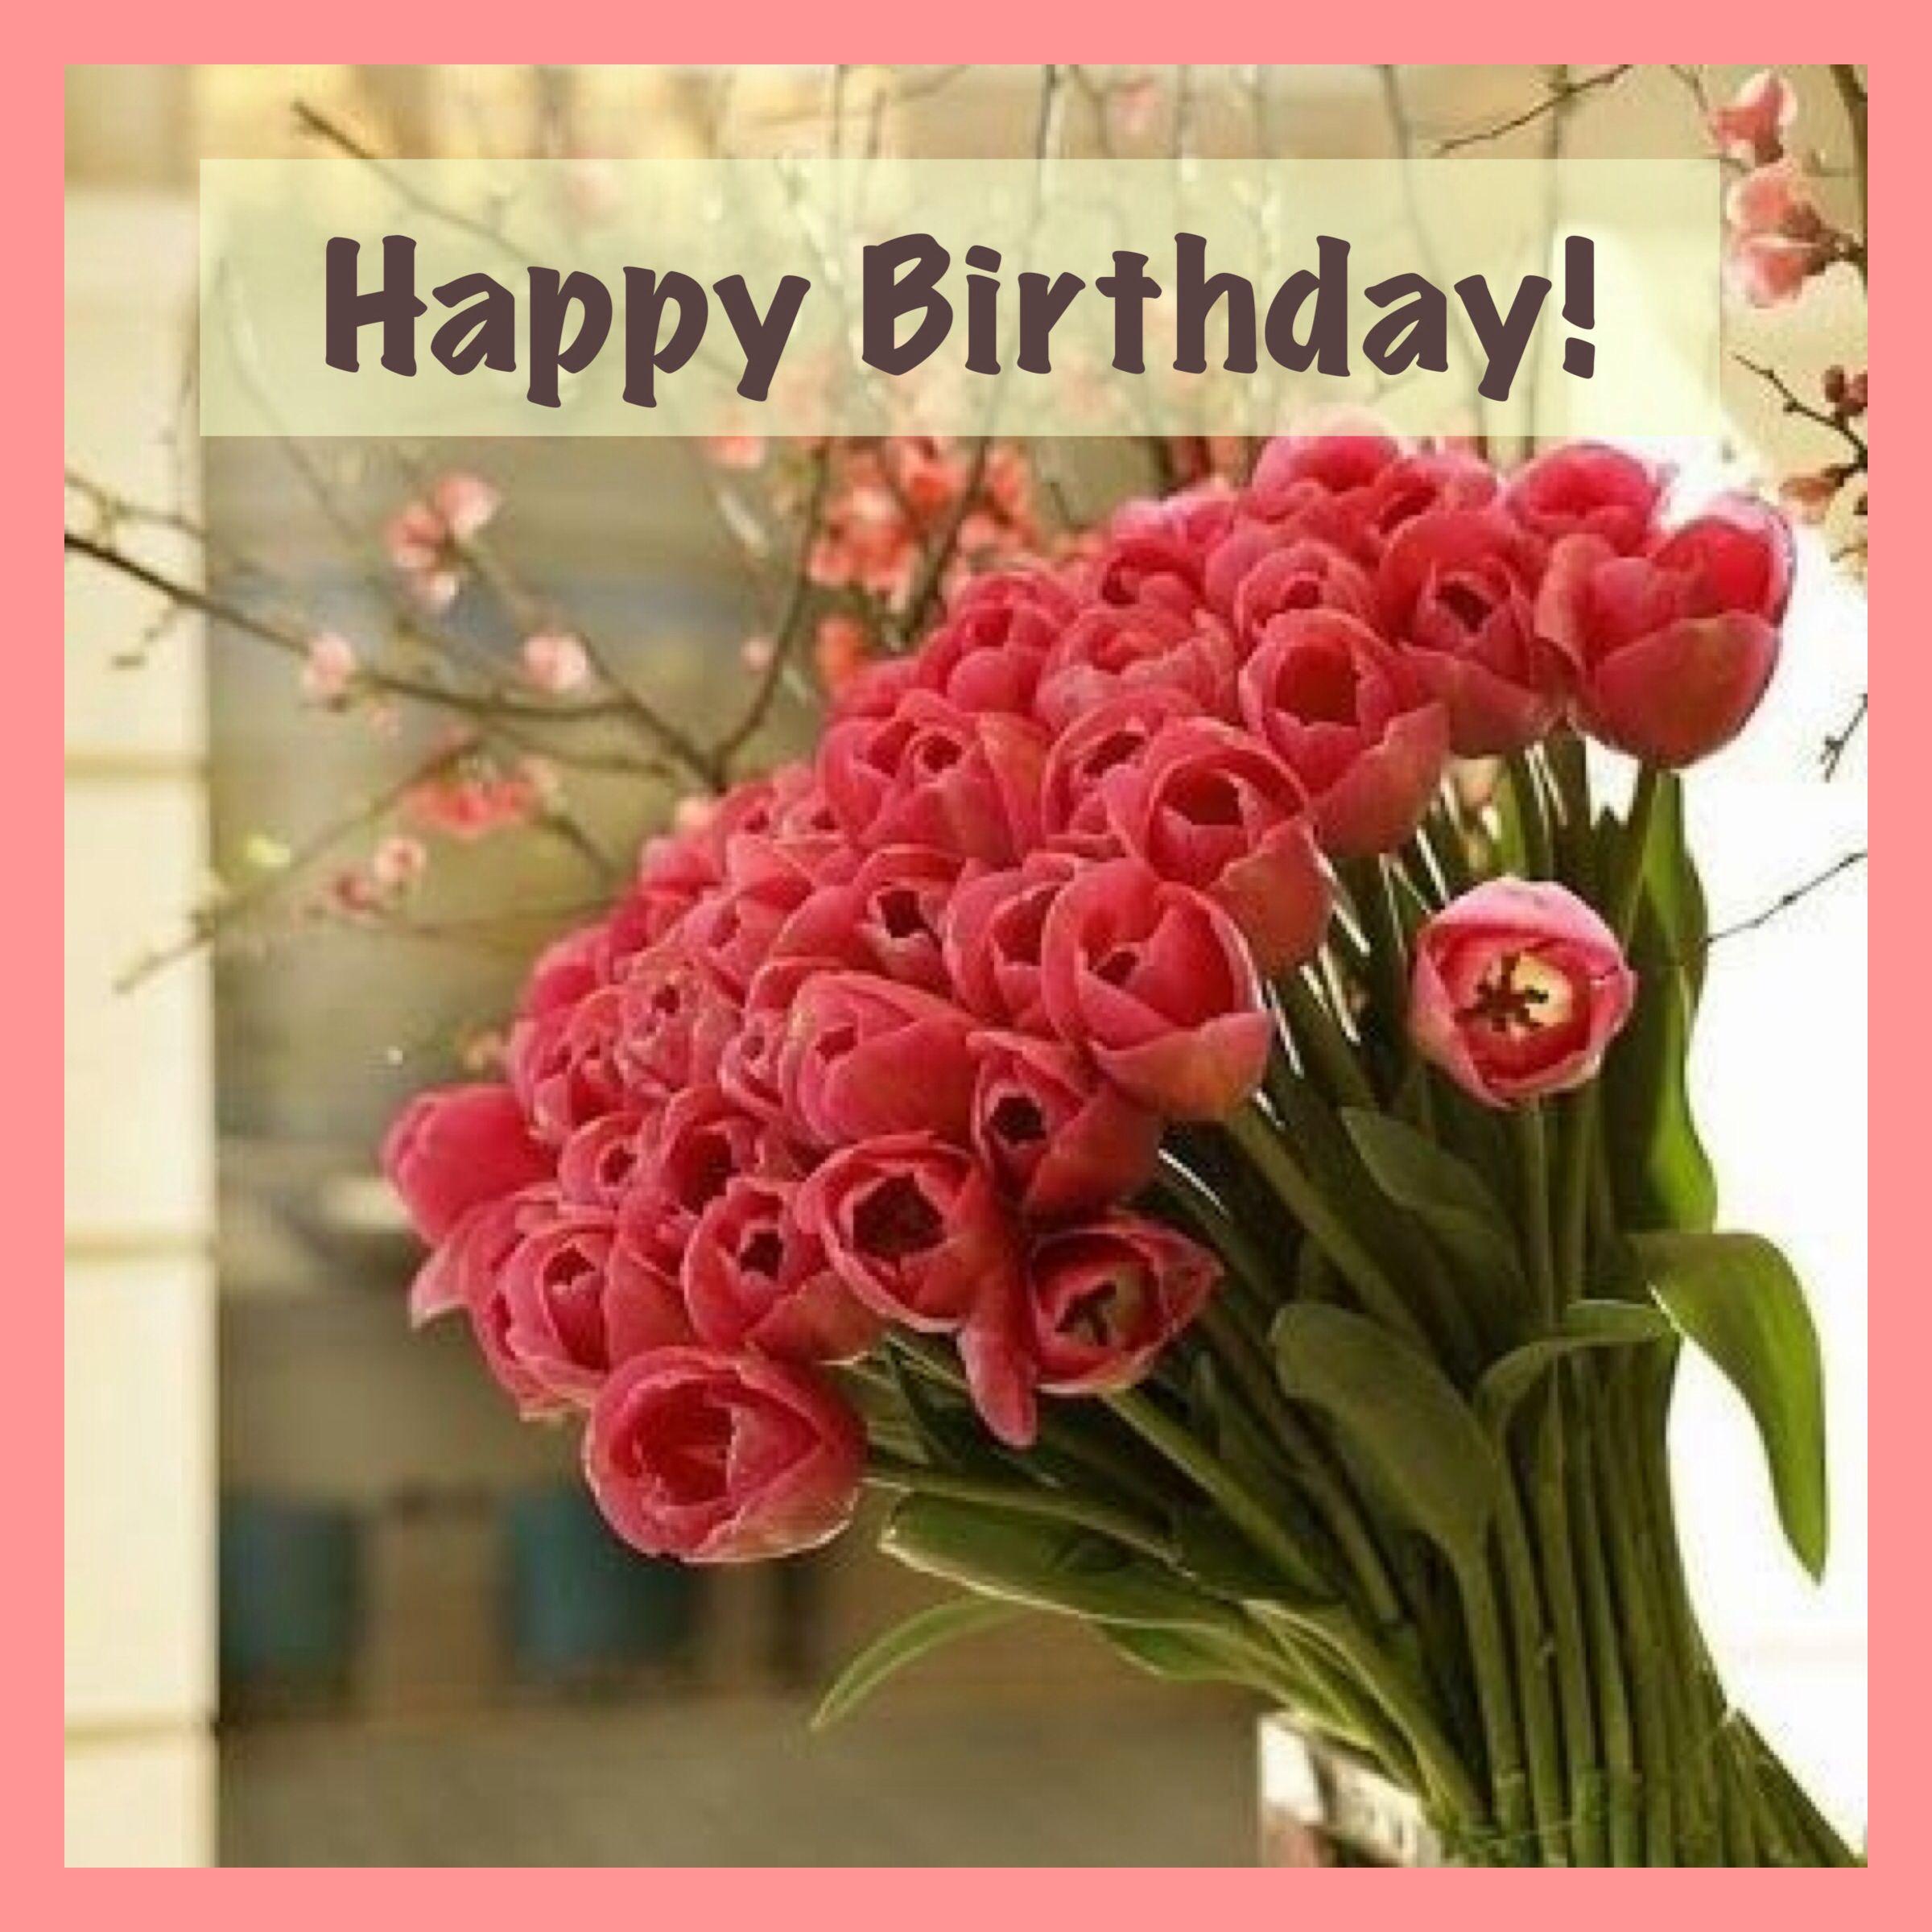 Happy Birthday Tjn Verjaardag Pinterest Happy Happy Birthday Pictures With Wishes